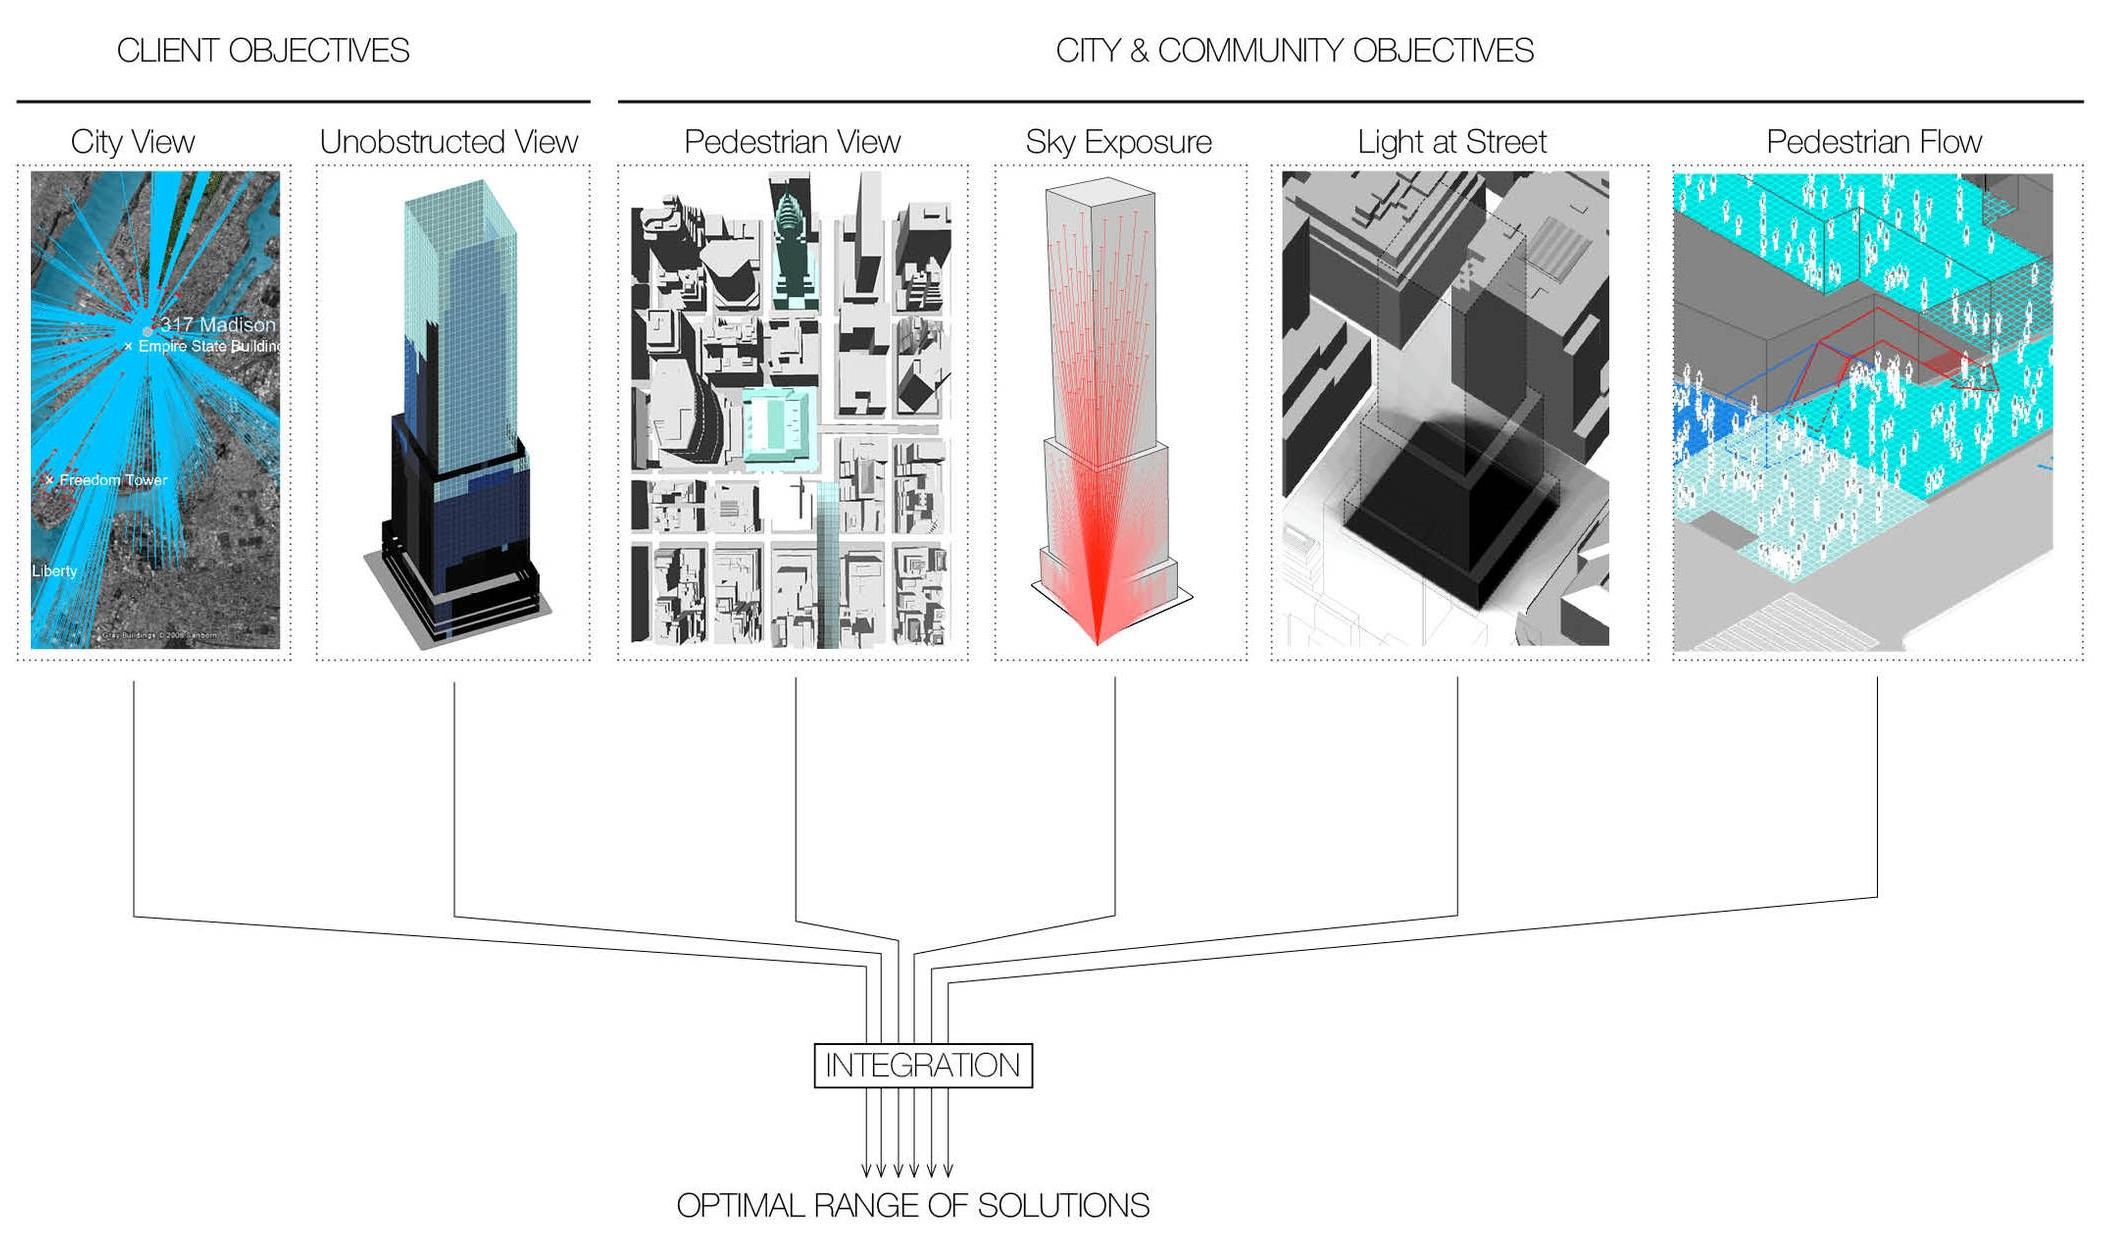 Example diagram for One Vanderbilt of stakeholder objectives. Image credit: KPFui